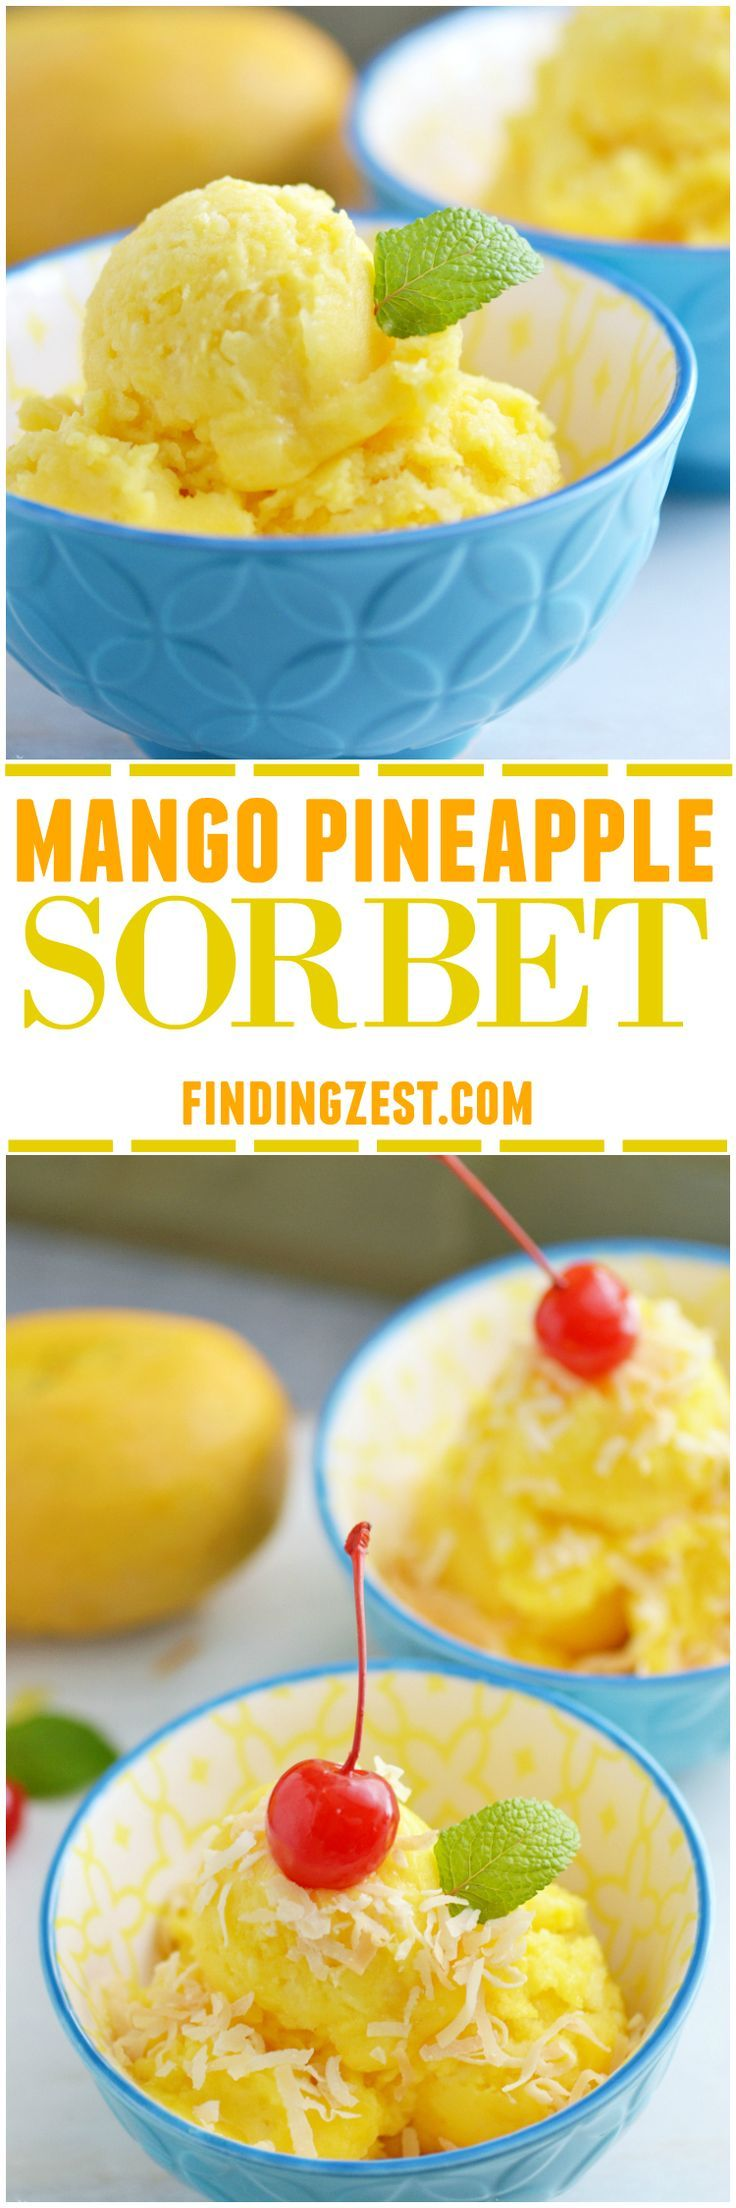 Mango Pineapple Sorbet